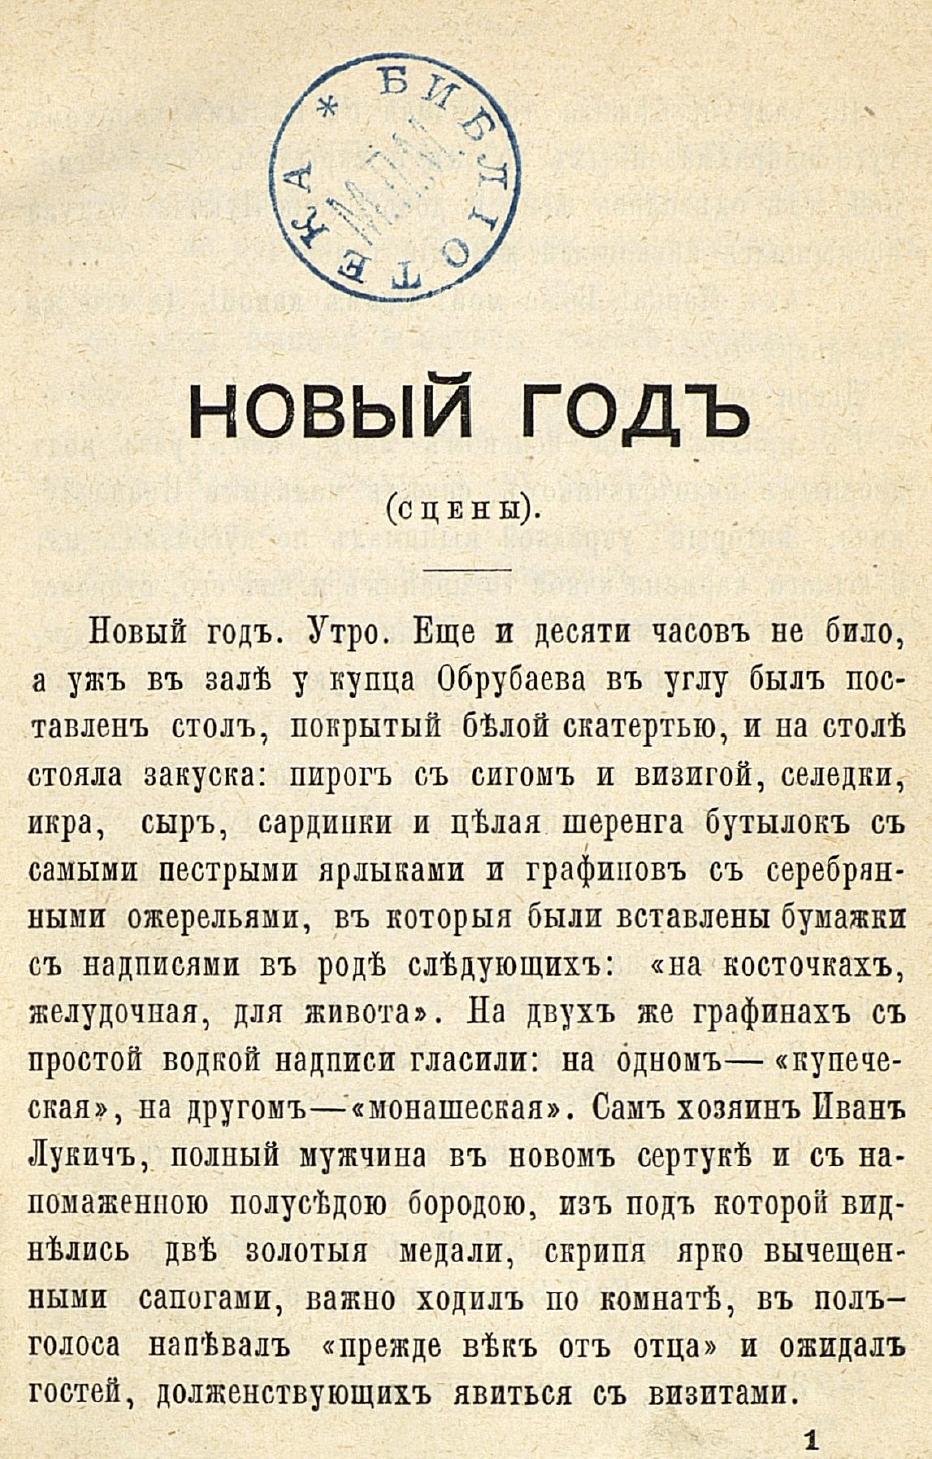 http://images.vfl.ru/ii/1406813644/f8ef1069/5858576.jpg